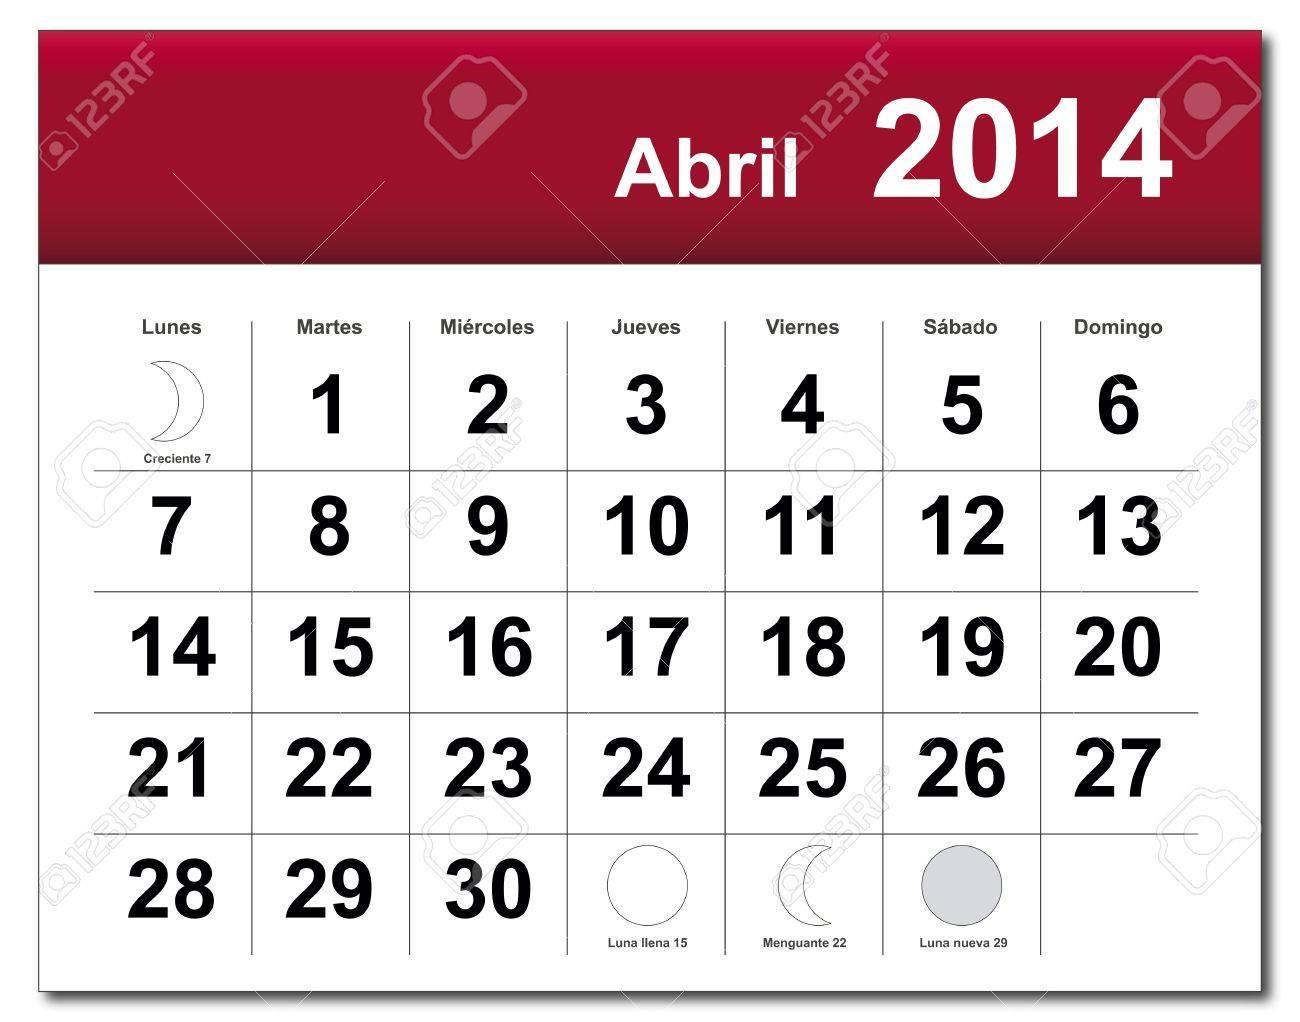 Spanish version of April 2014 calendar. Stock Vector - 21643847